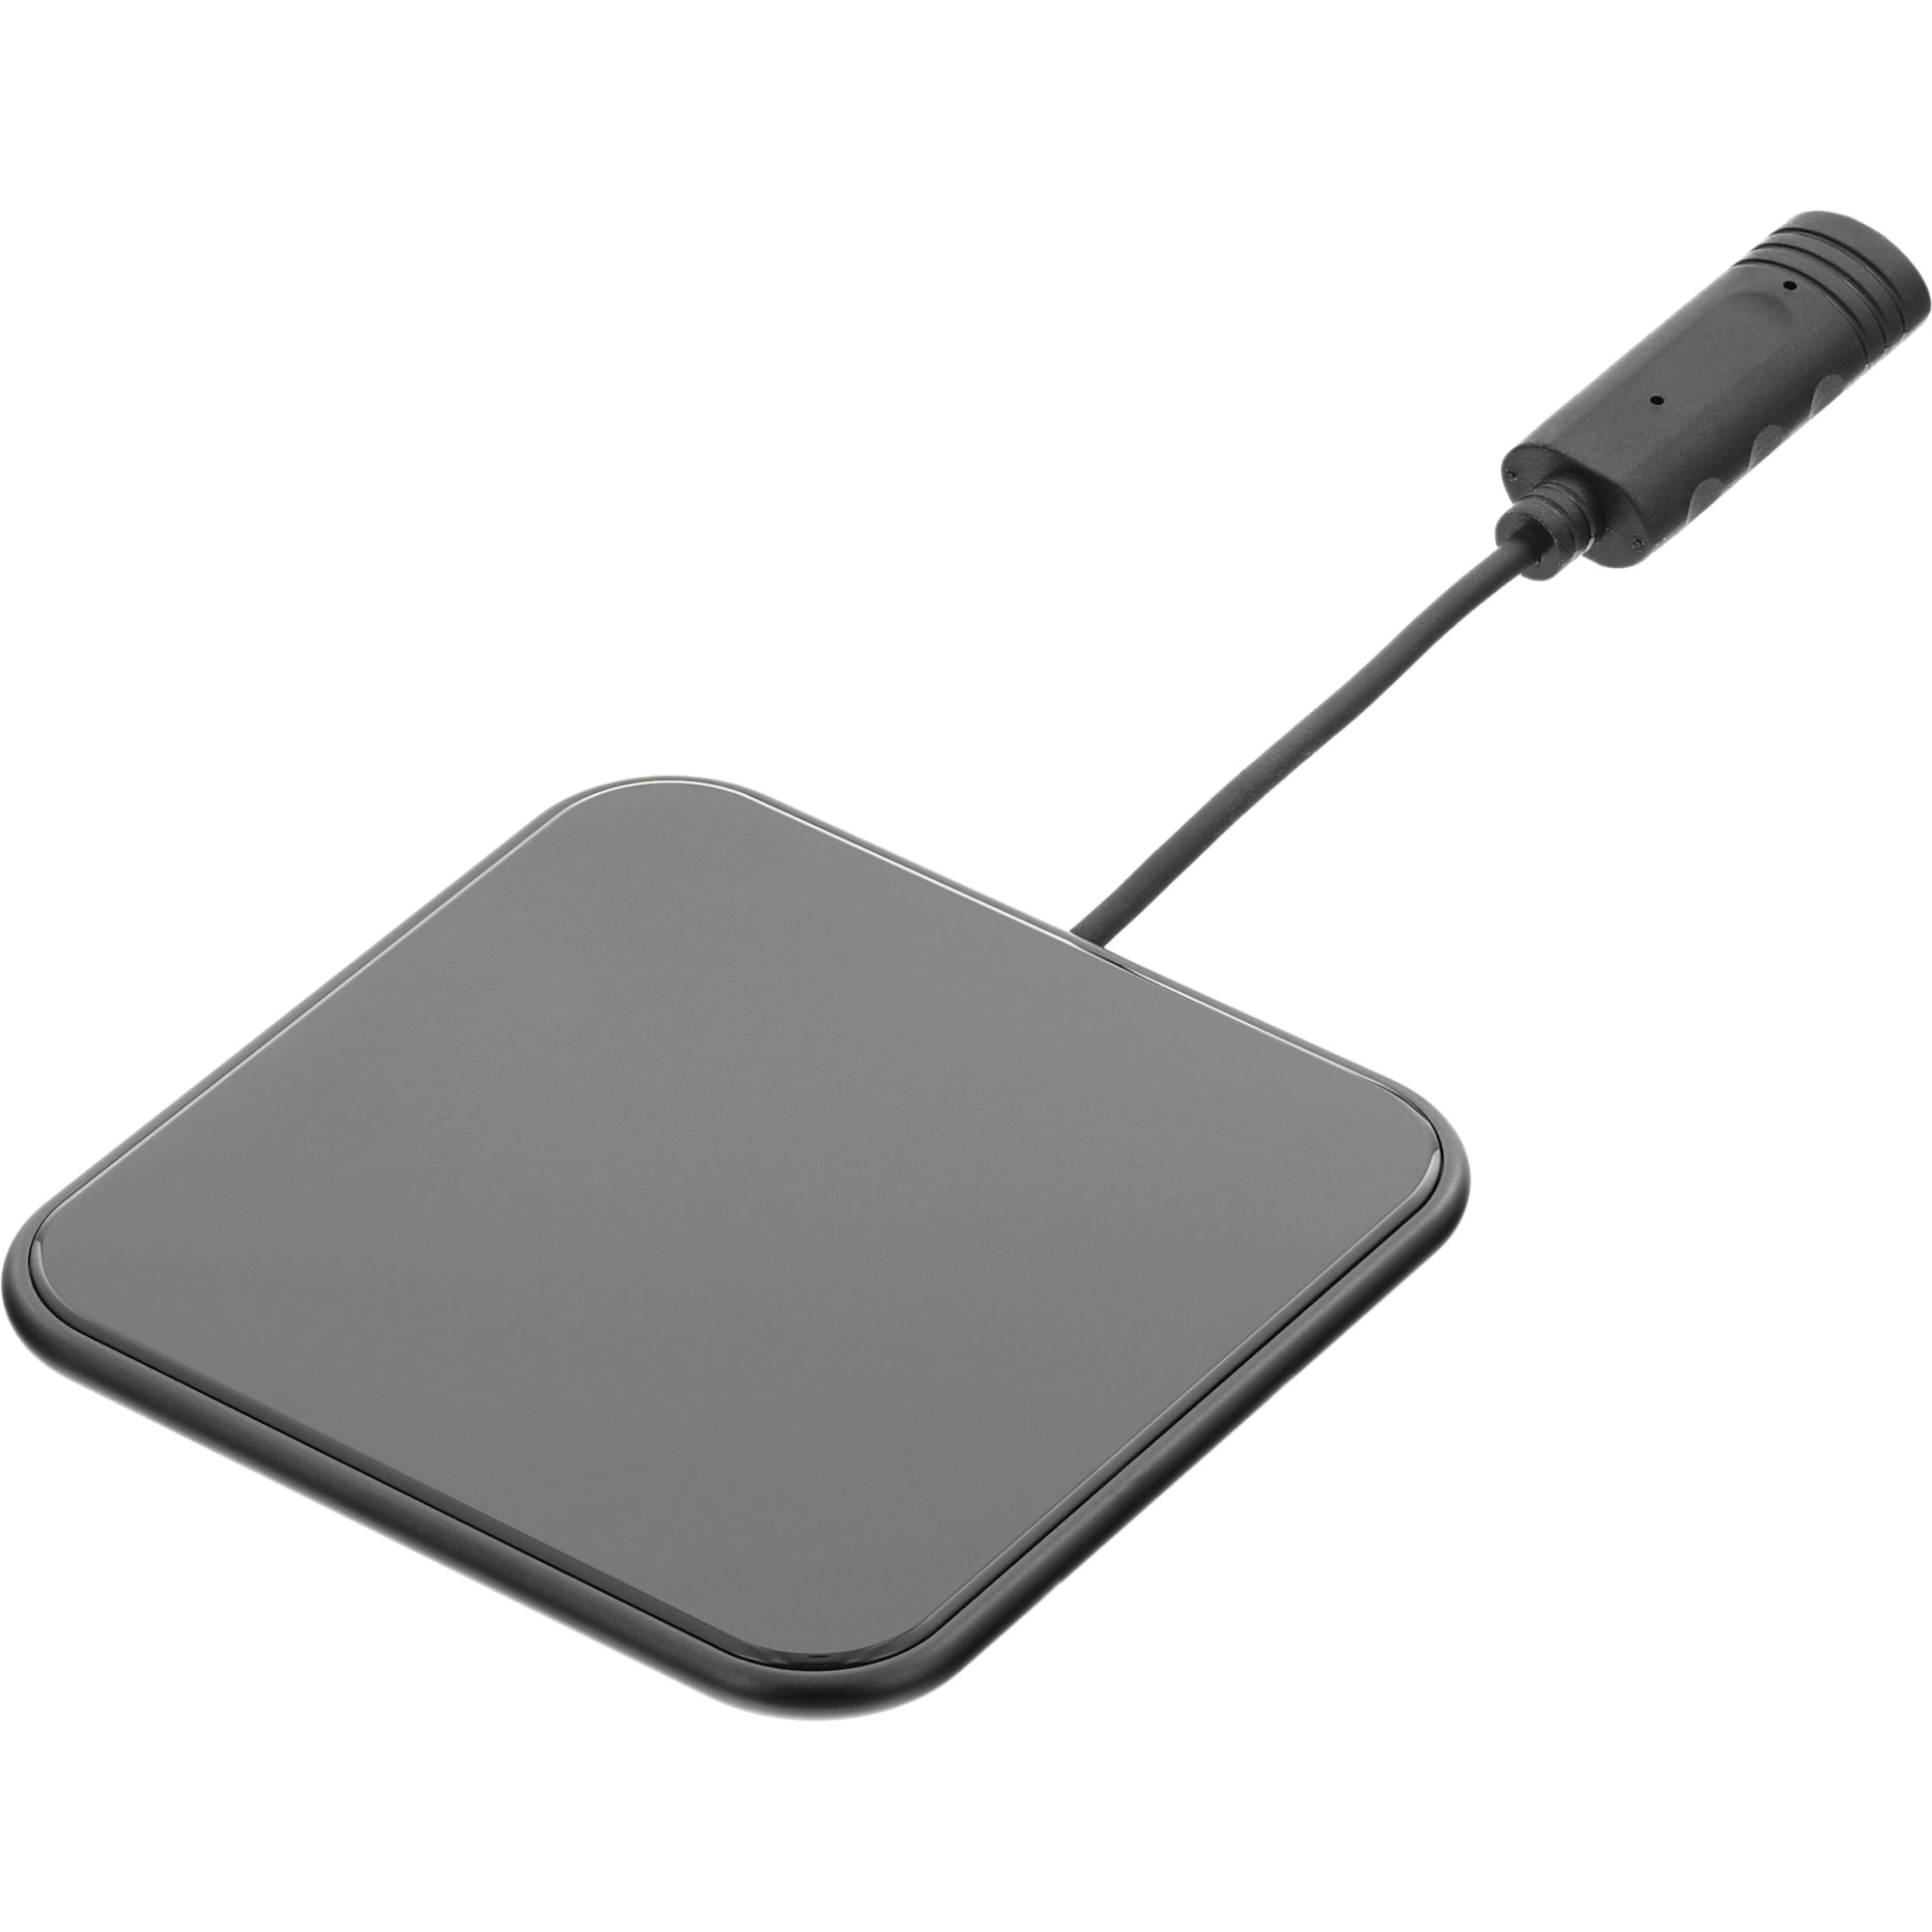 Fotografie Incarcator wireless Tellur, Certificat Qi, 10W, Negru